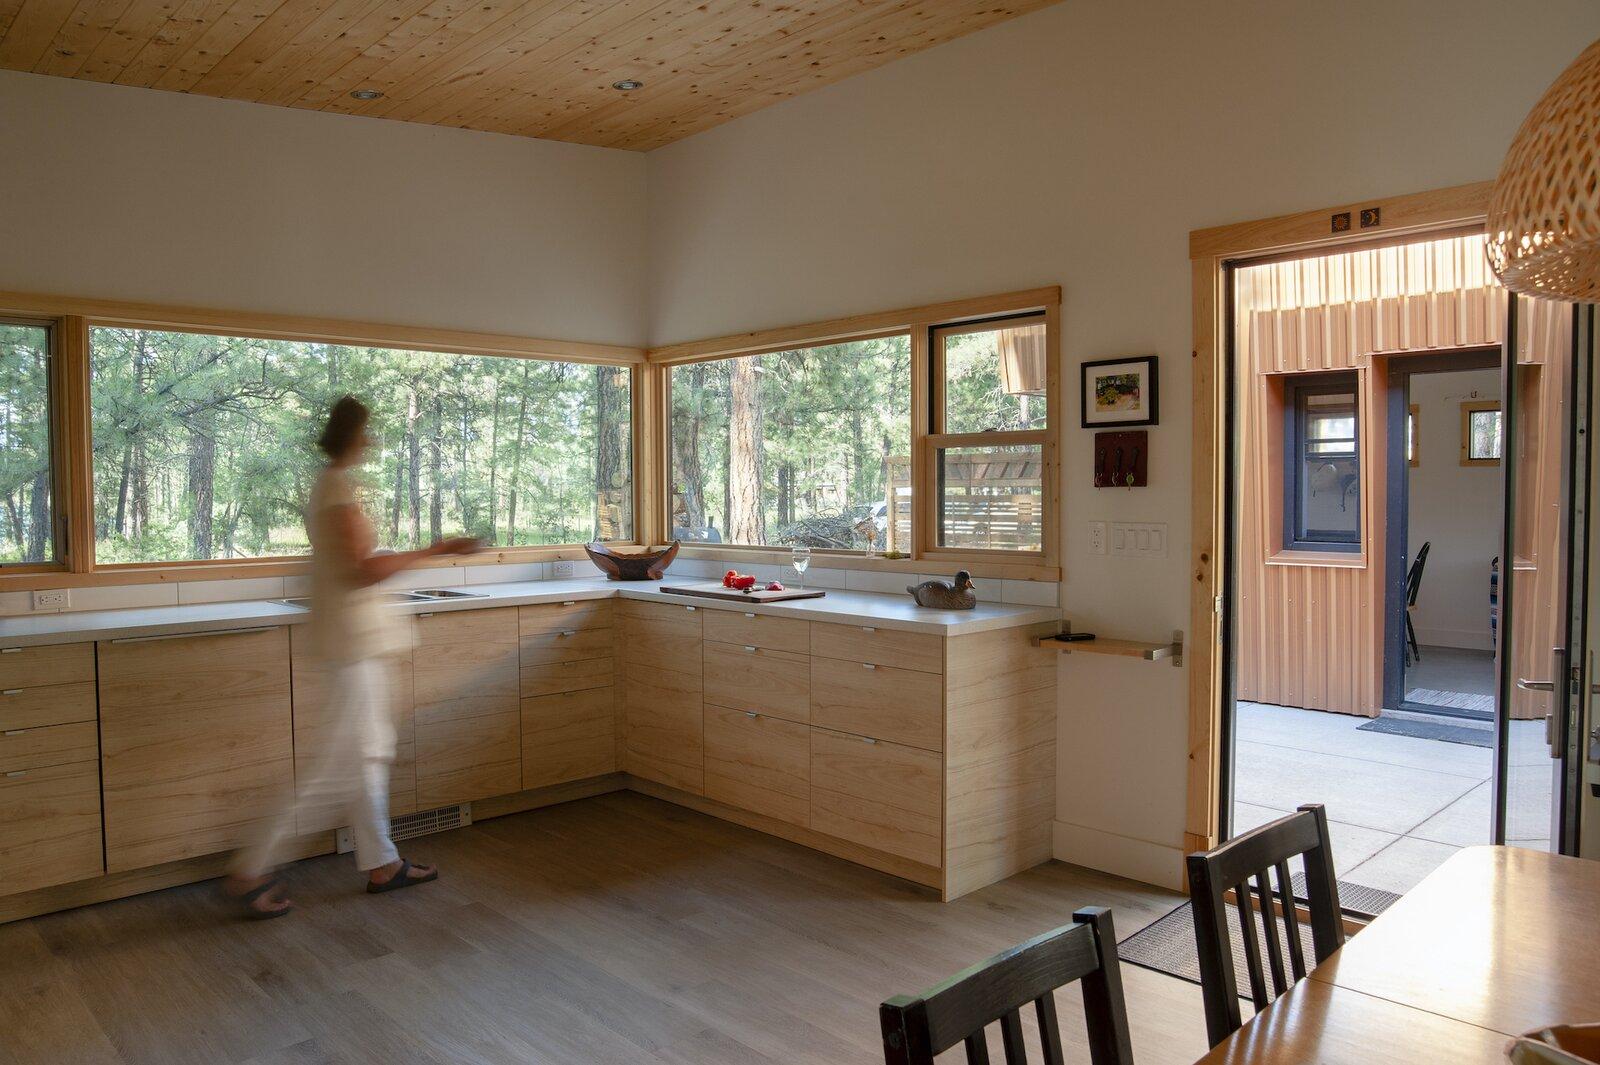 Kitchen of Treegazer cabin.